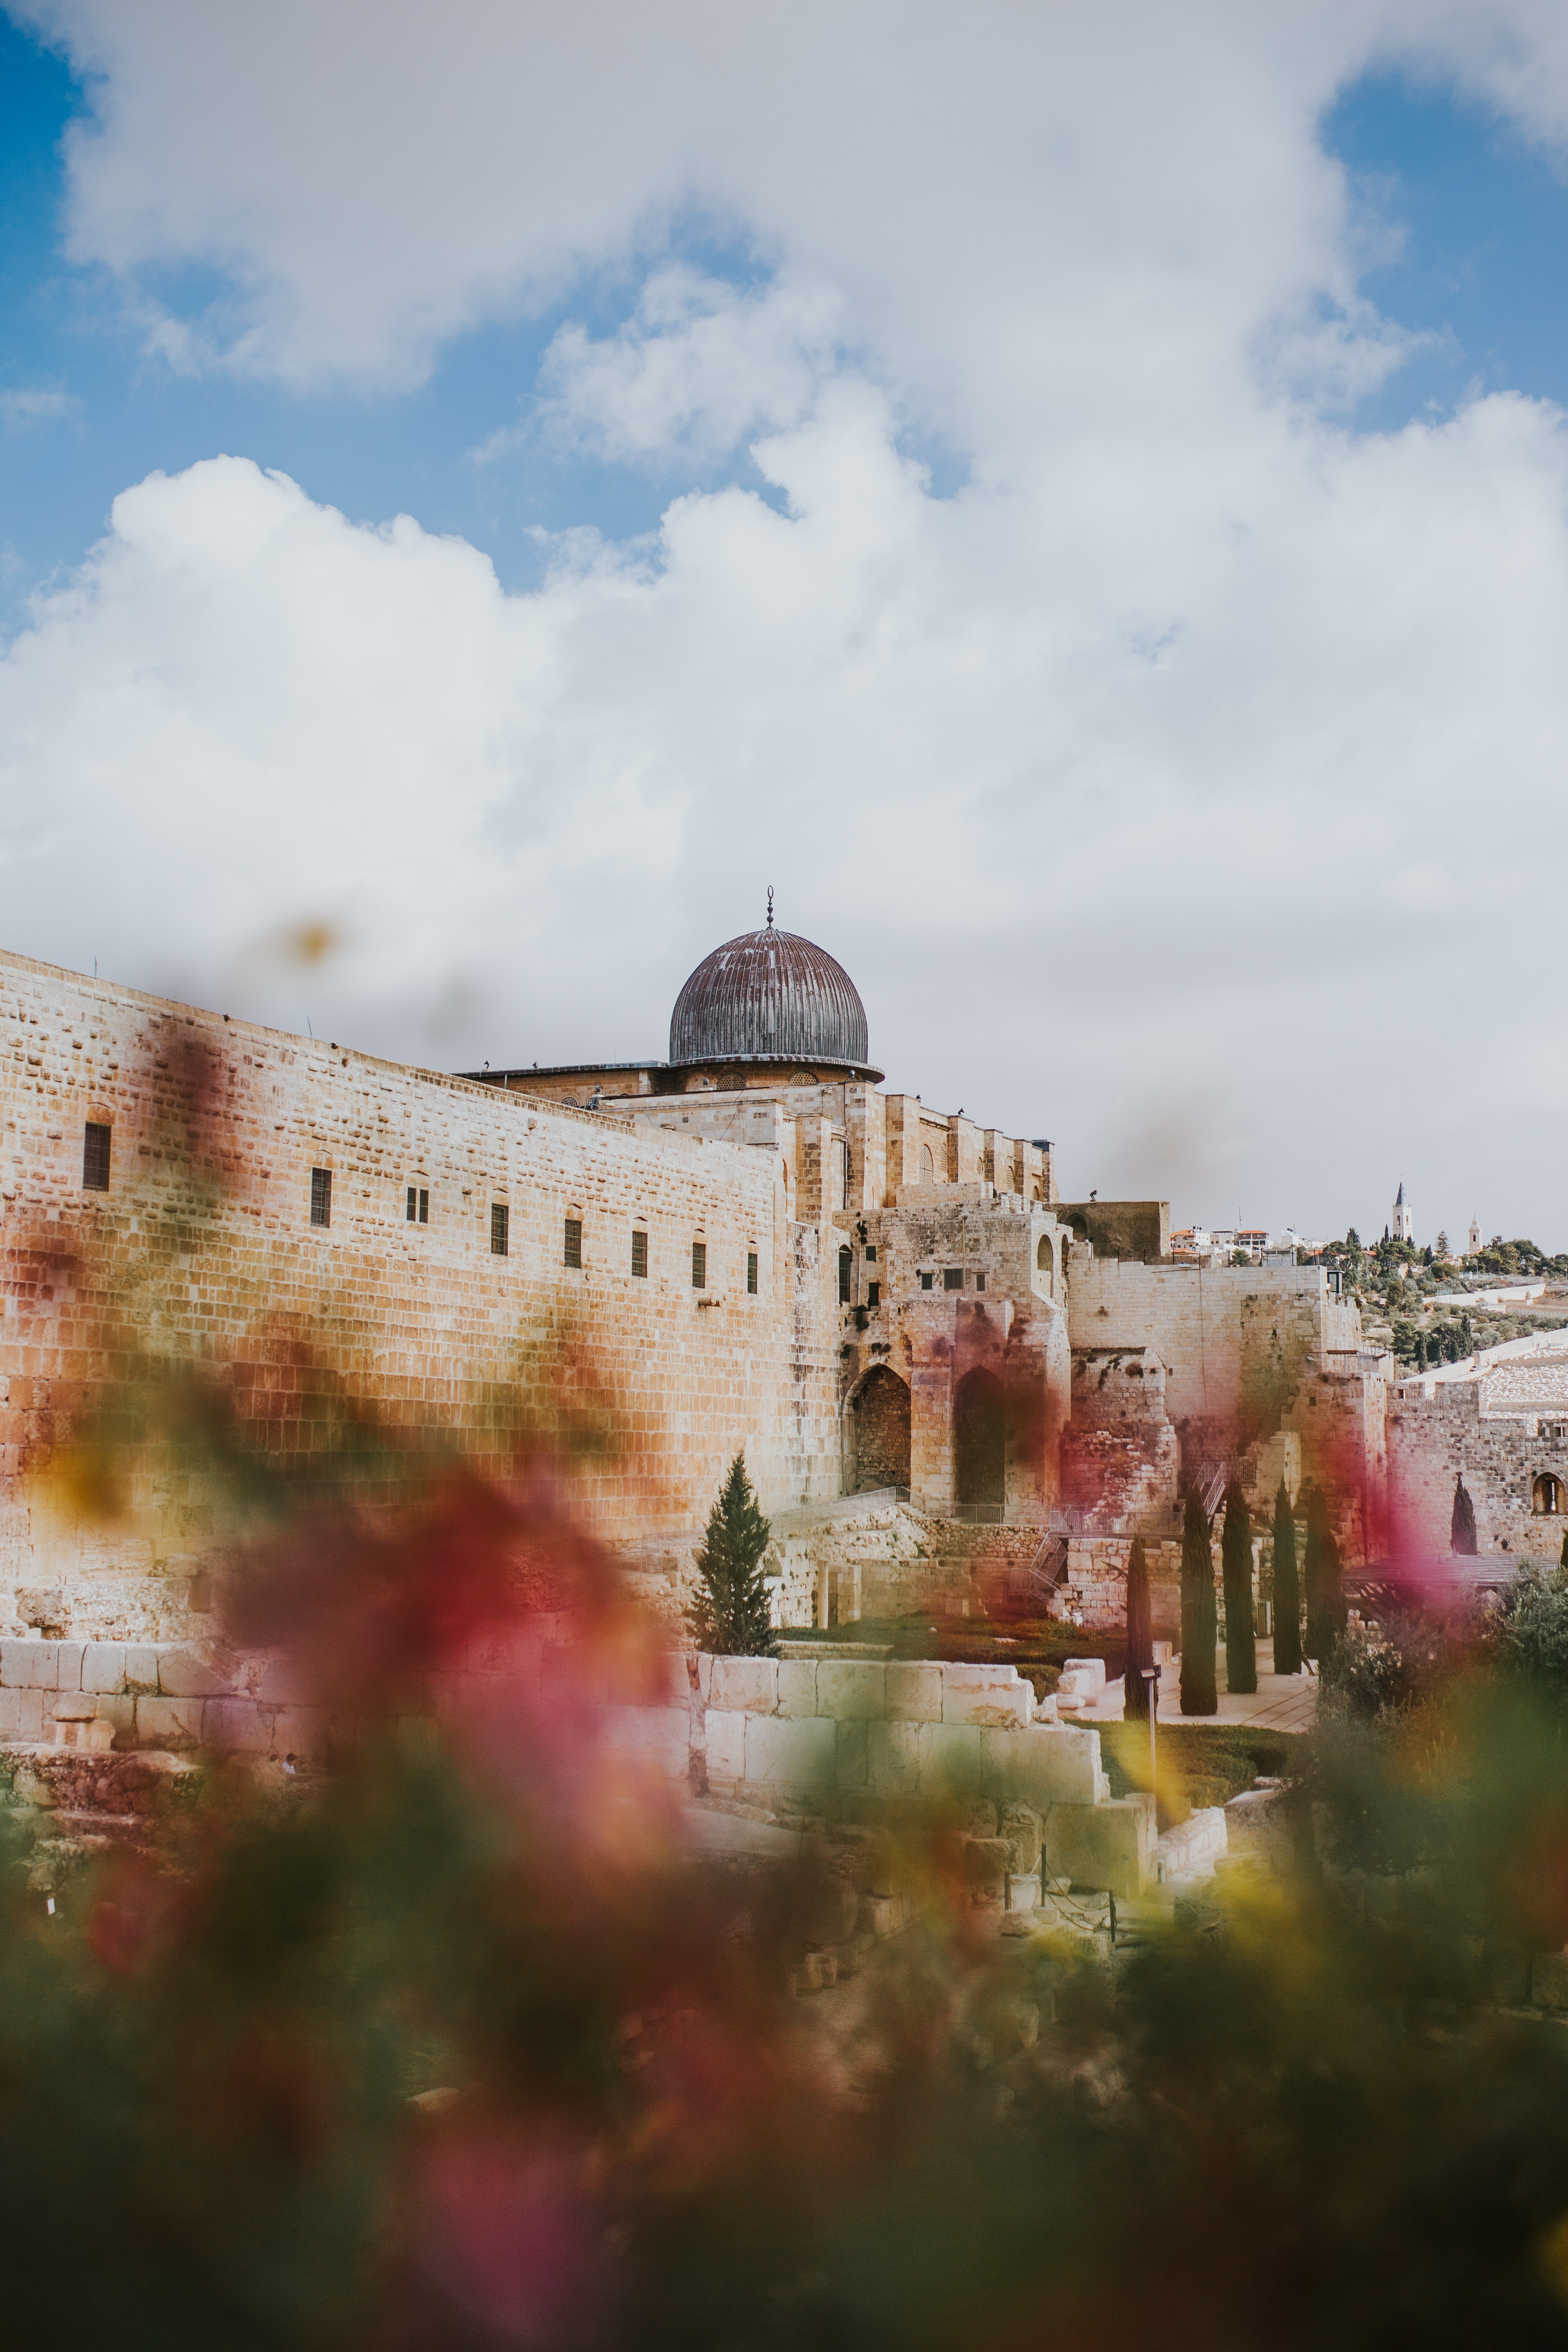 Israel Photo by: Robert Ruggiero